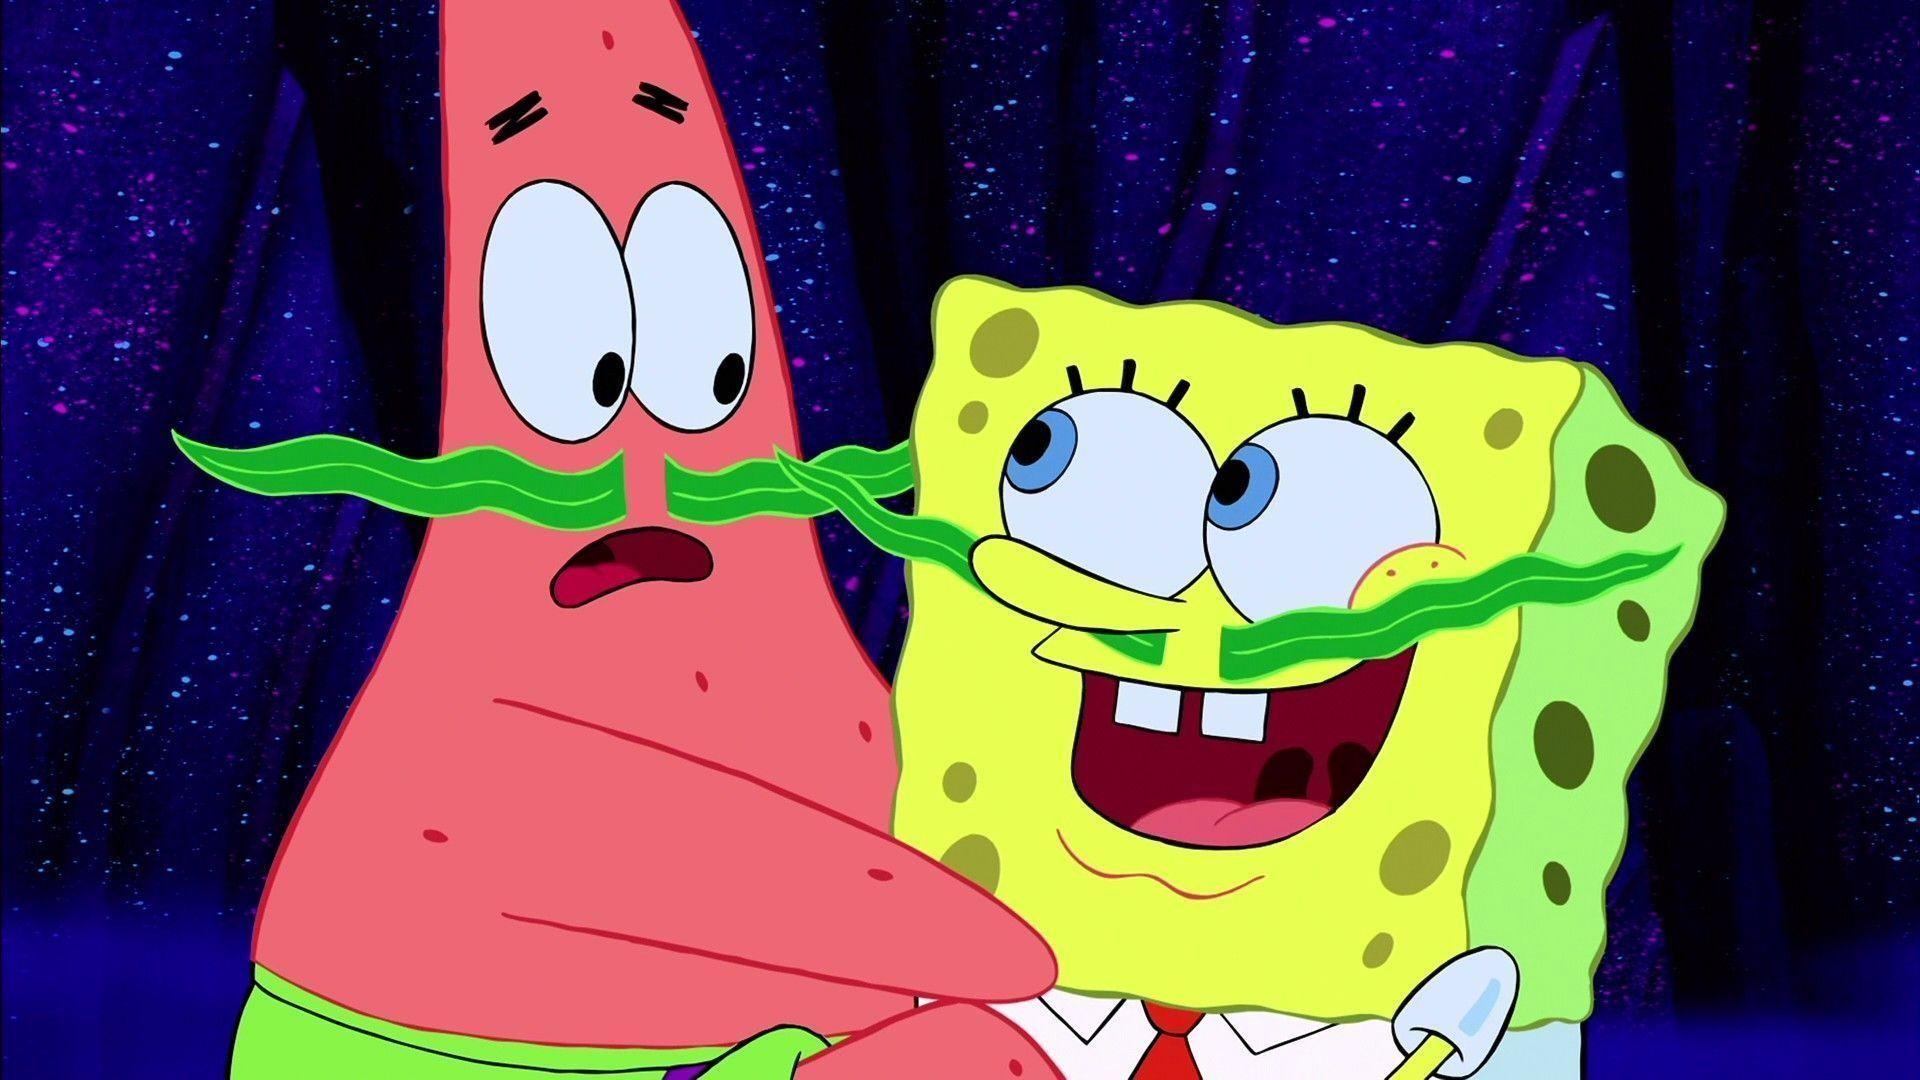 Spongebob Squarepants Patrick Background HD Wa #791 .